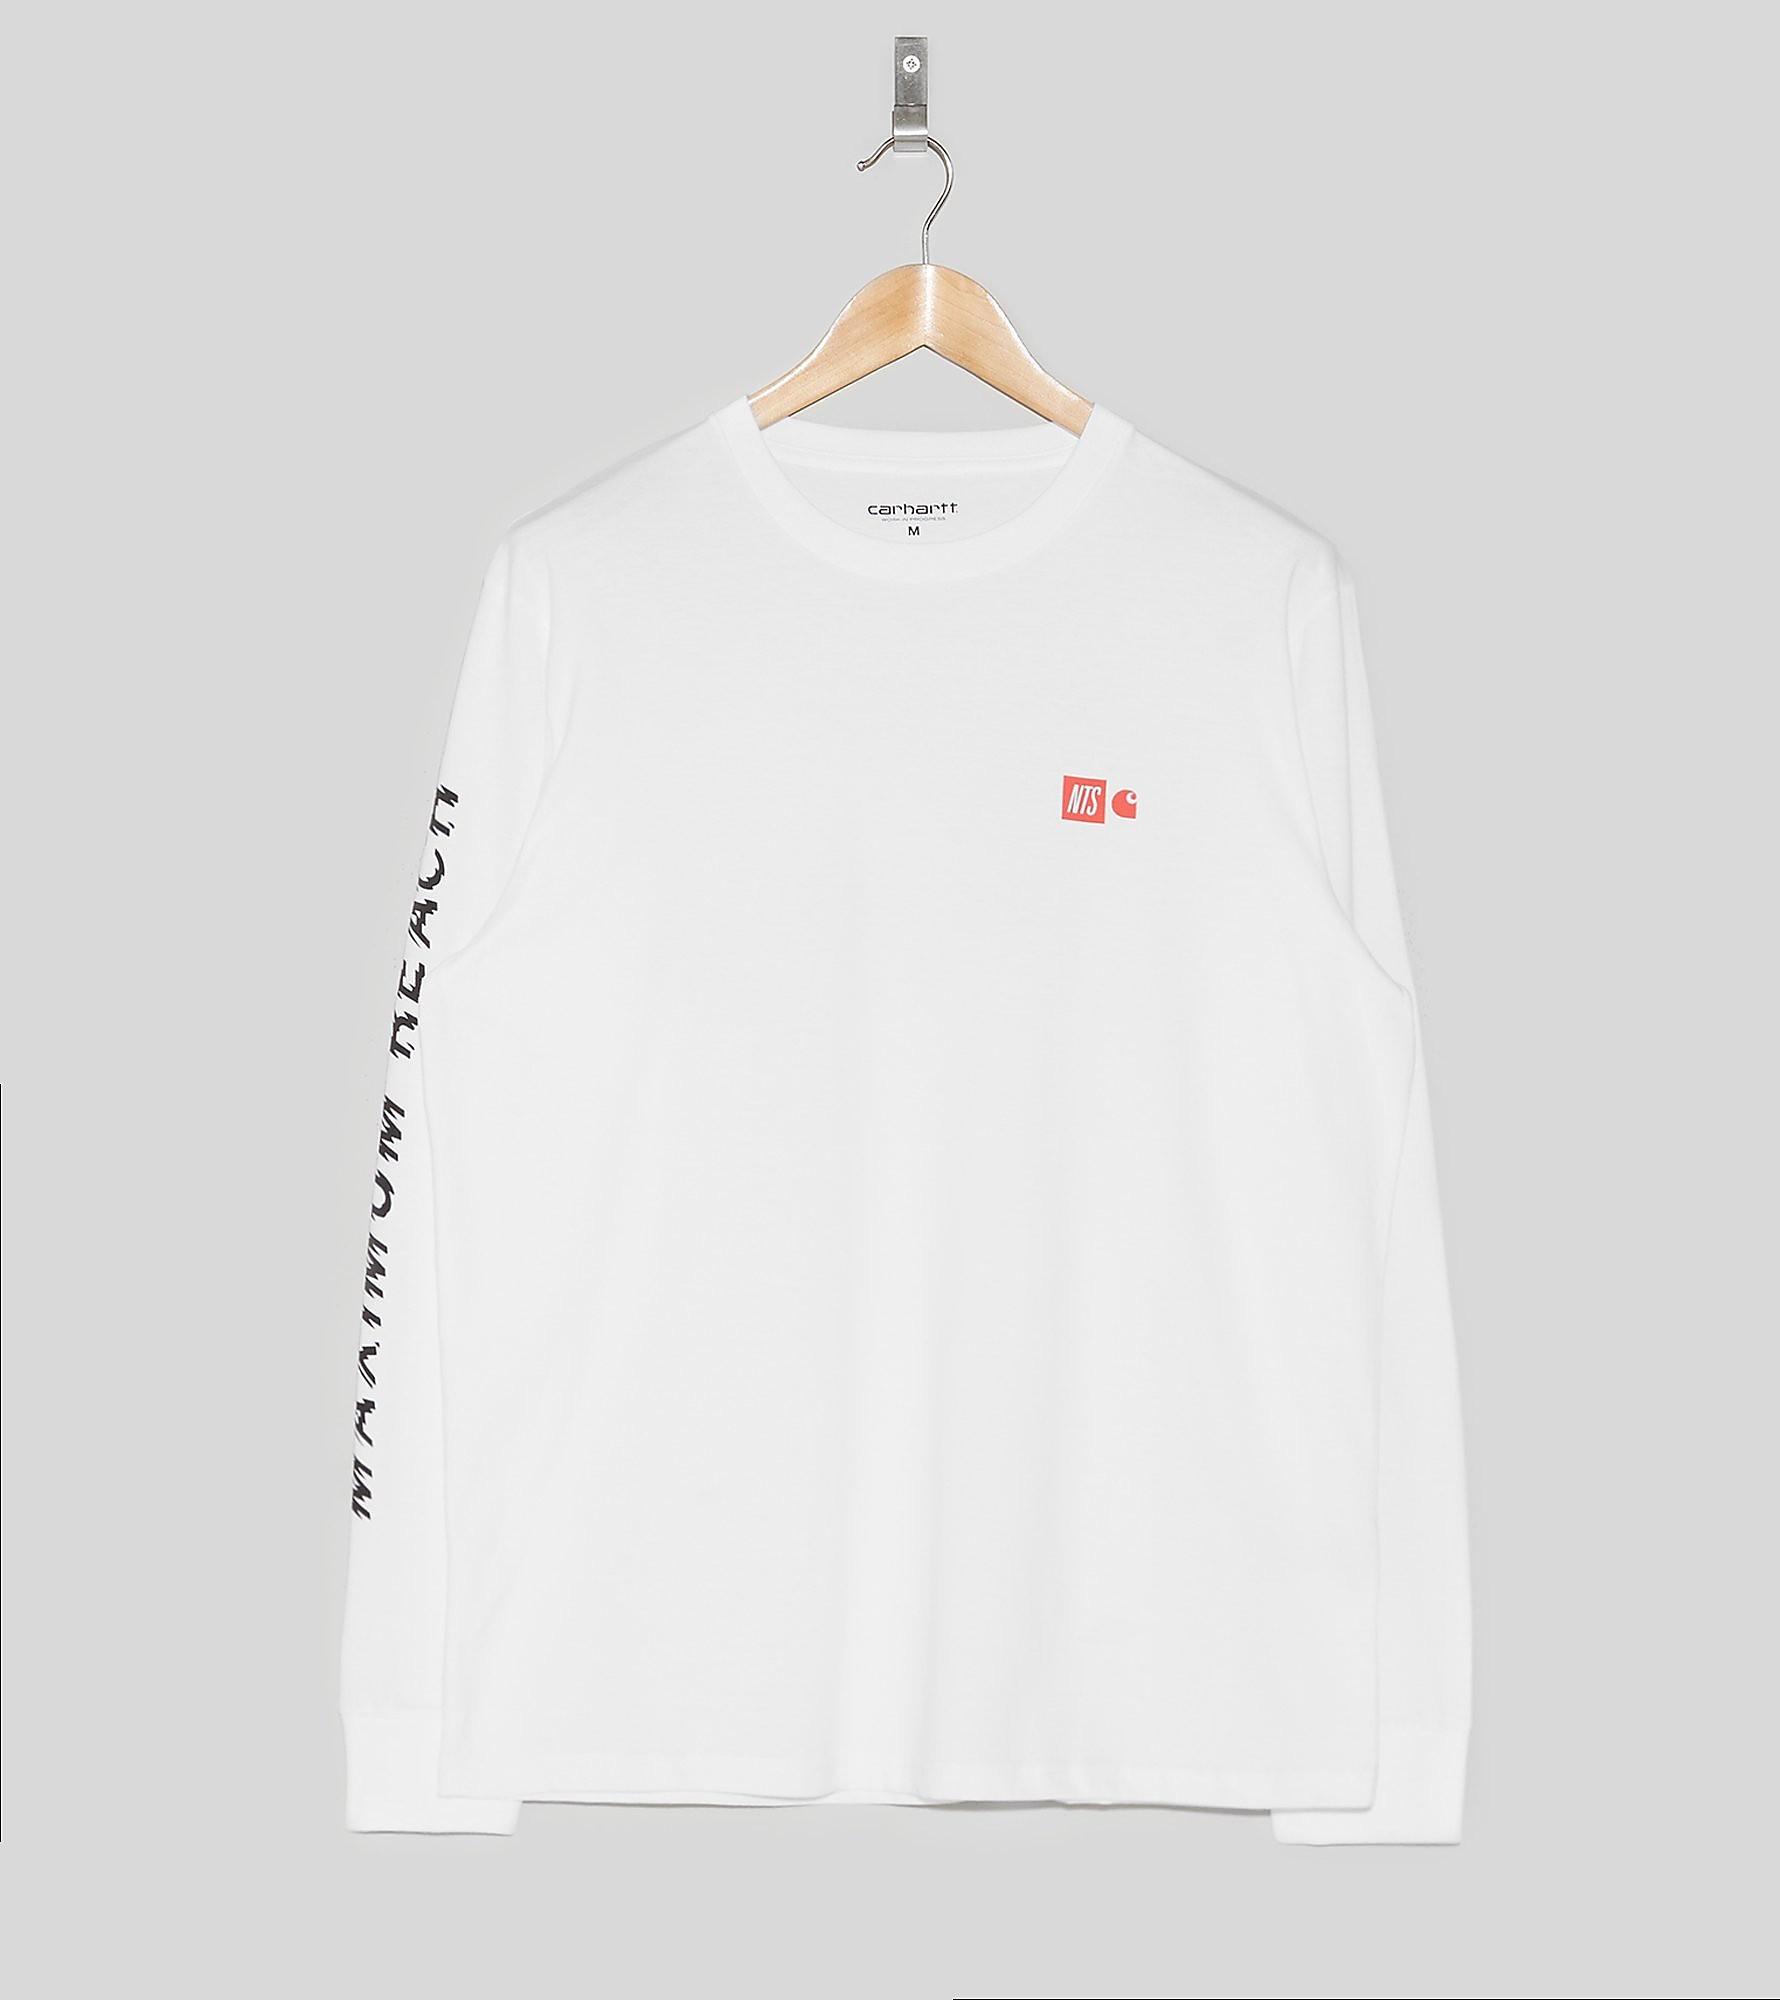 Carhartt WIP x NTS Radio Long-Sleeved Maximum Reach T-Shirt